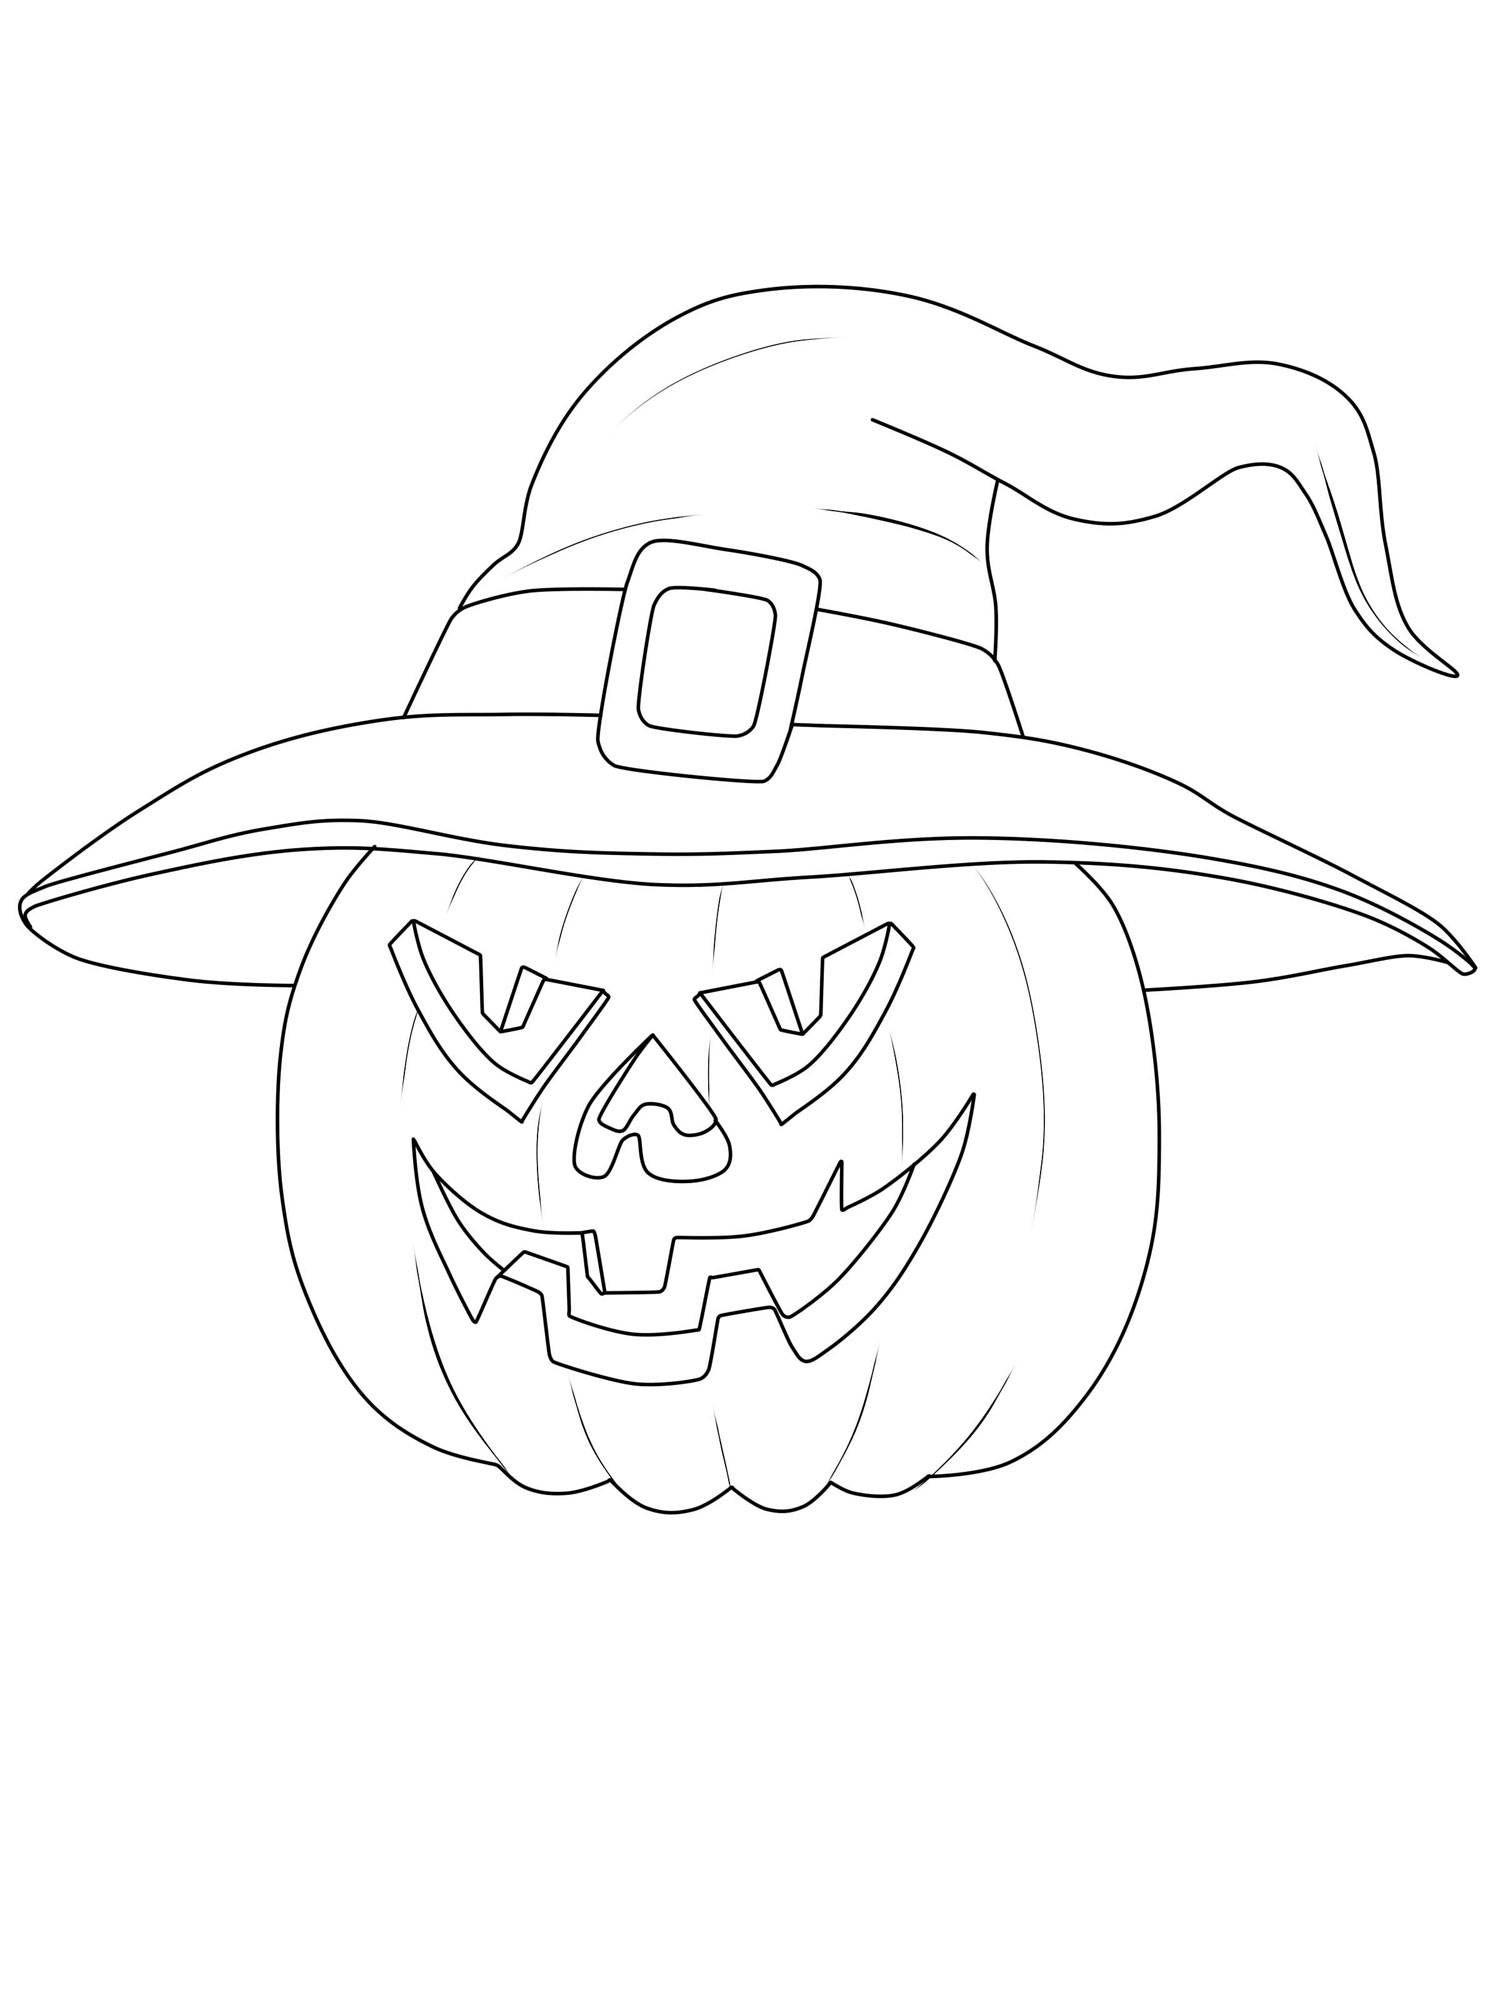 Ausmalbild Halloween: Kürbis-Hexe Ausmalen Kostenlos in Kürbis Ausmalbild